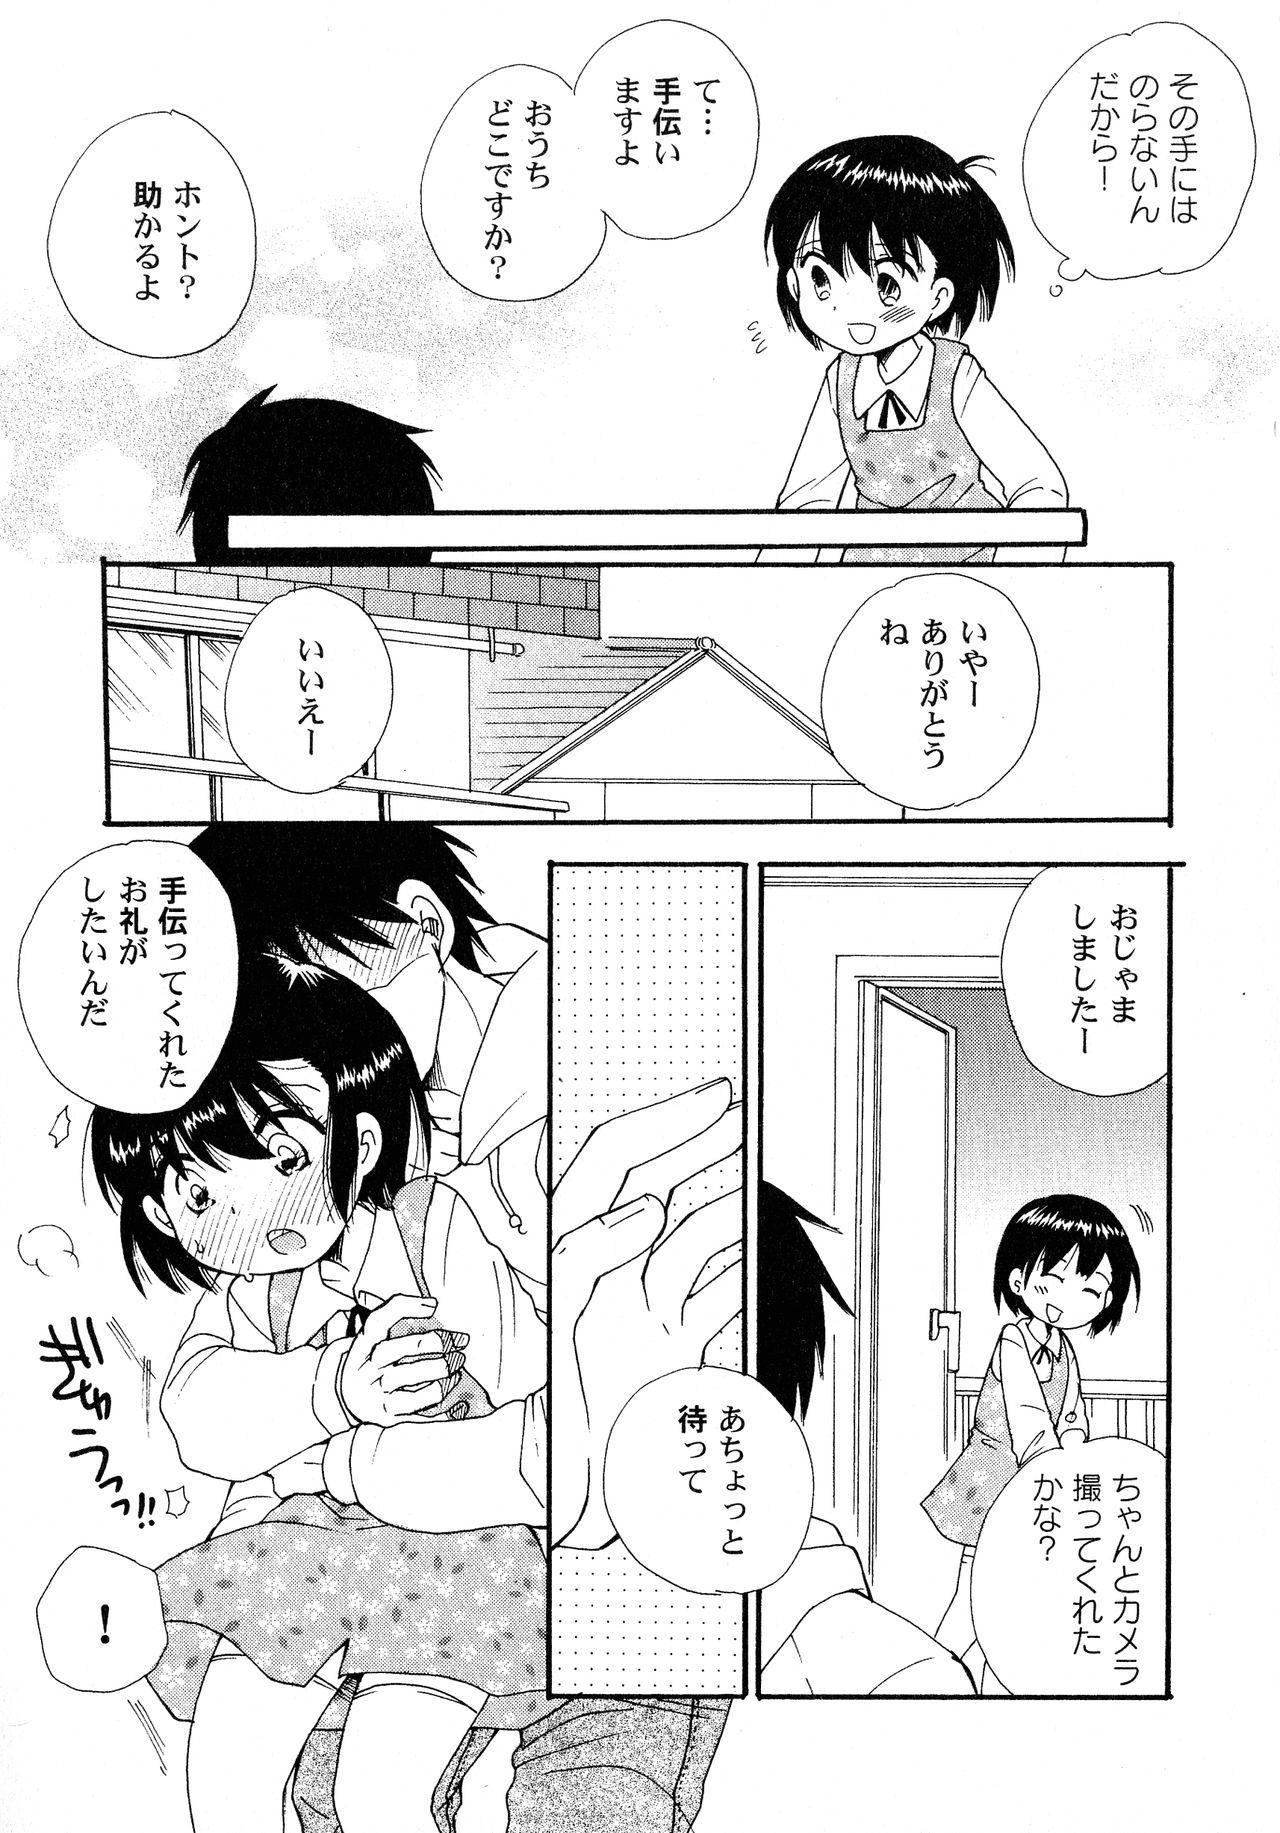 LoLiN Ameiro no Tokigo 6